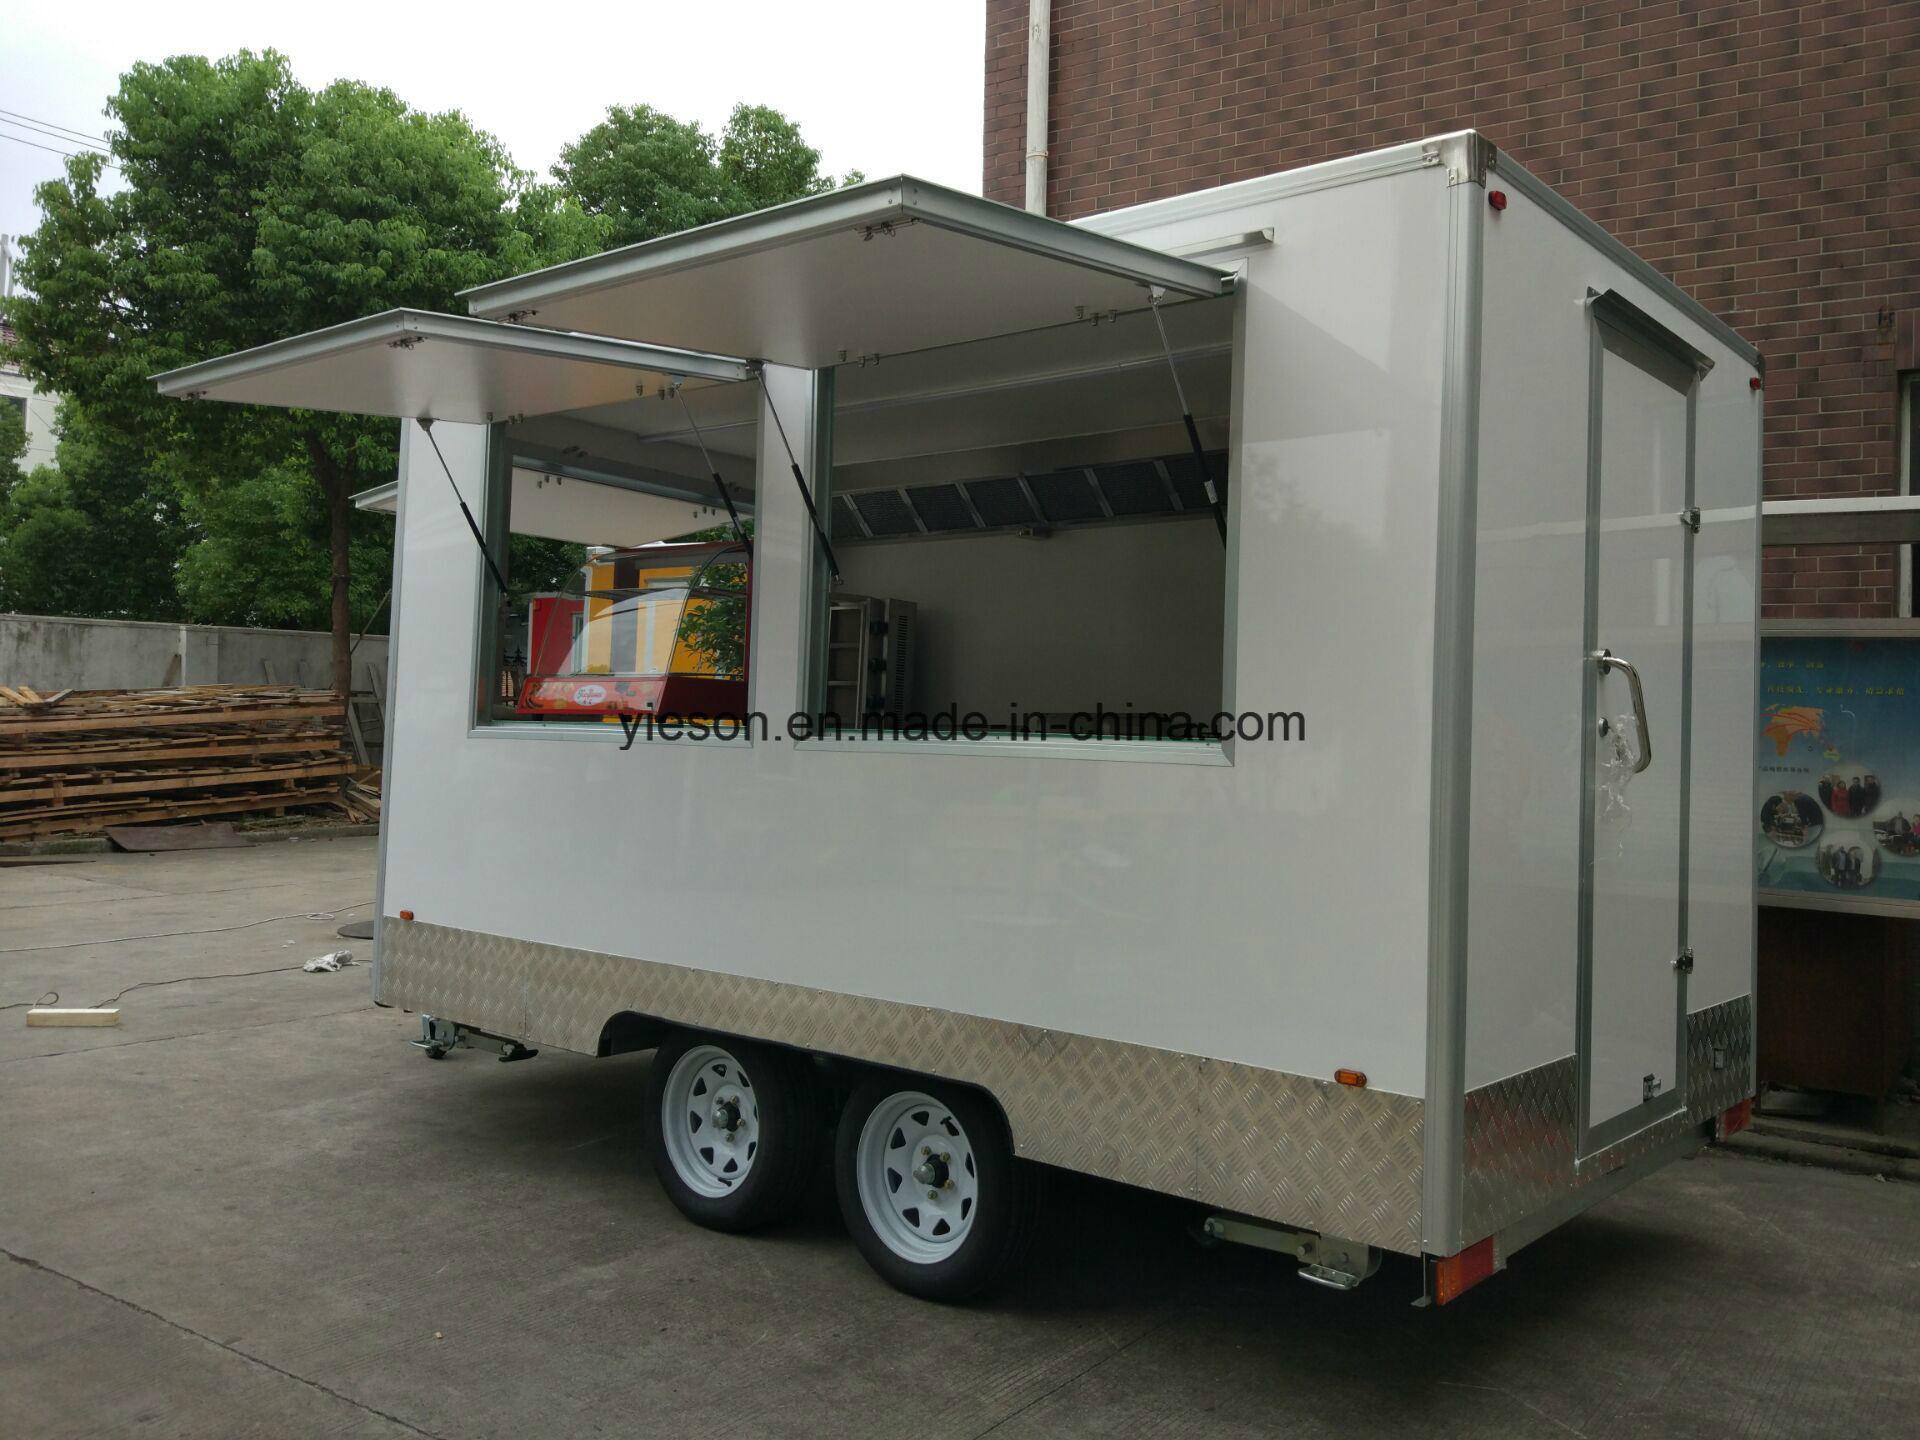 Ice Cream Fibreglass Caravan Mobile Kebab Van Mobile Food Trucks